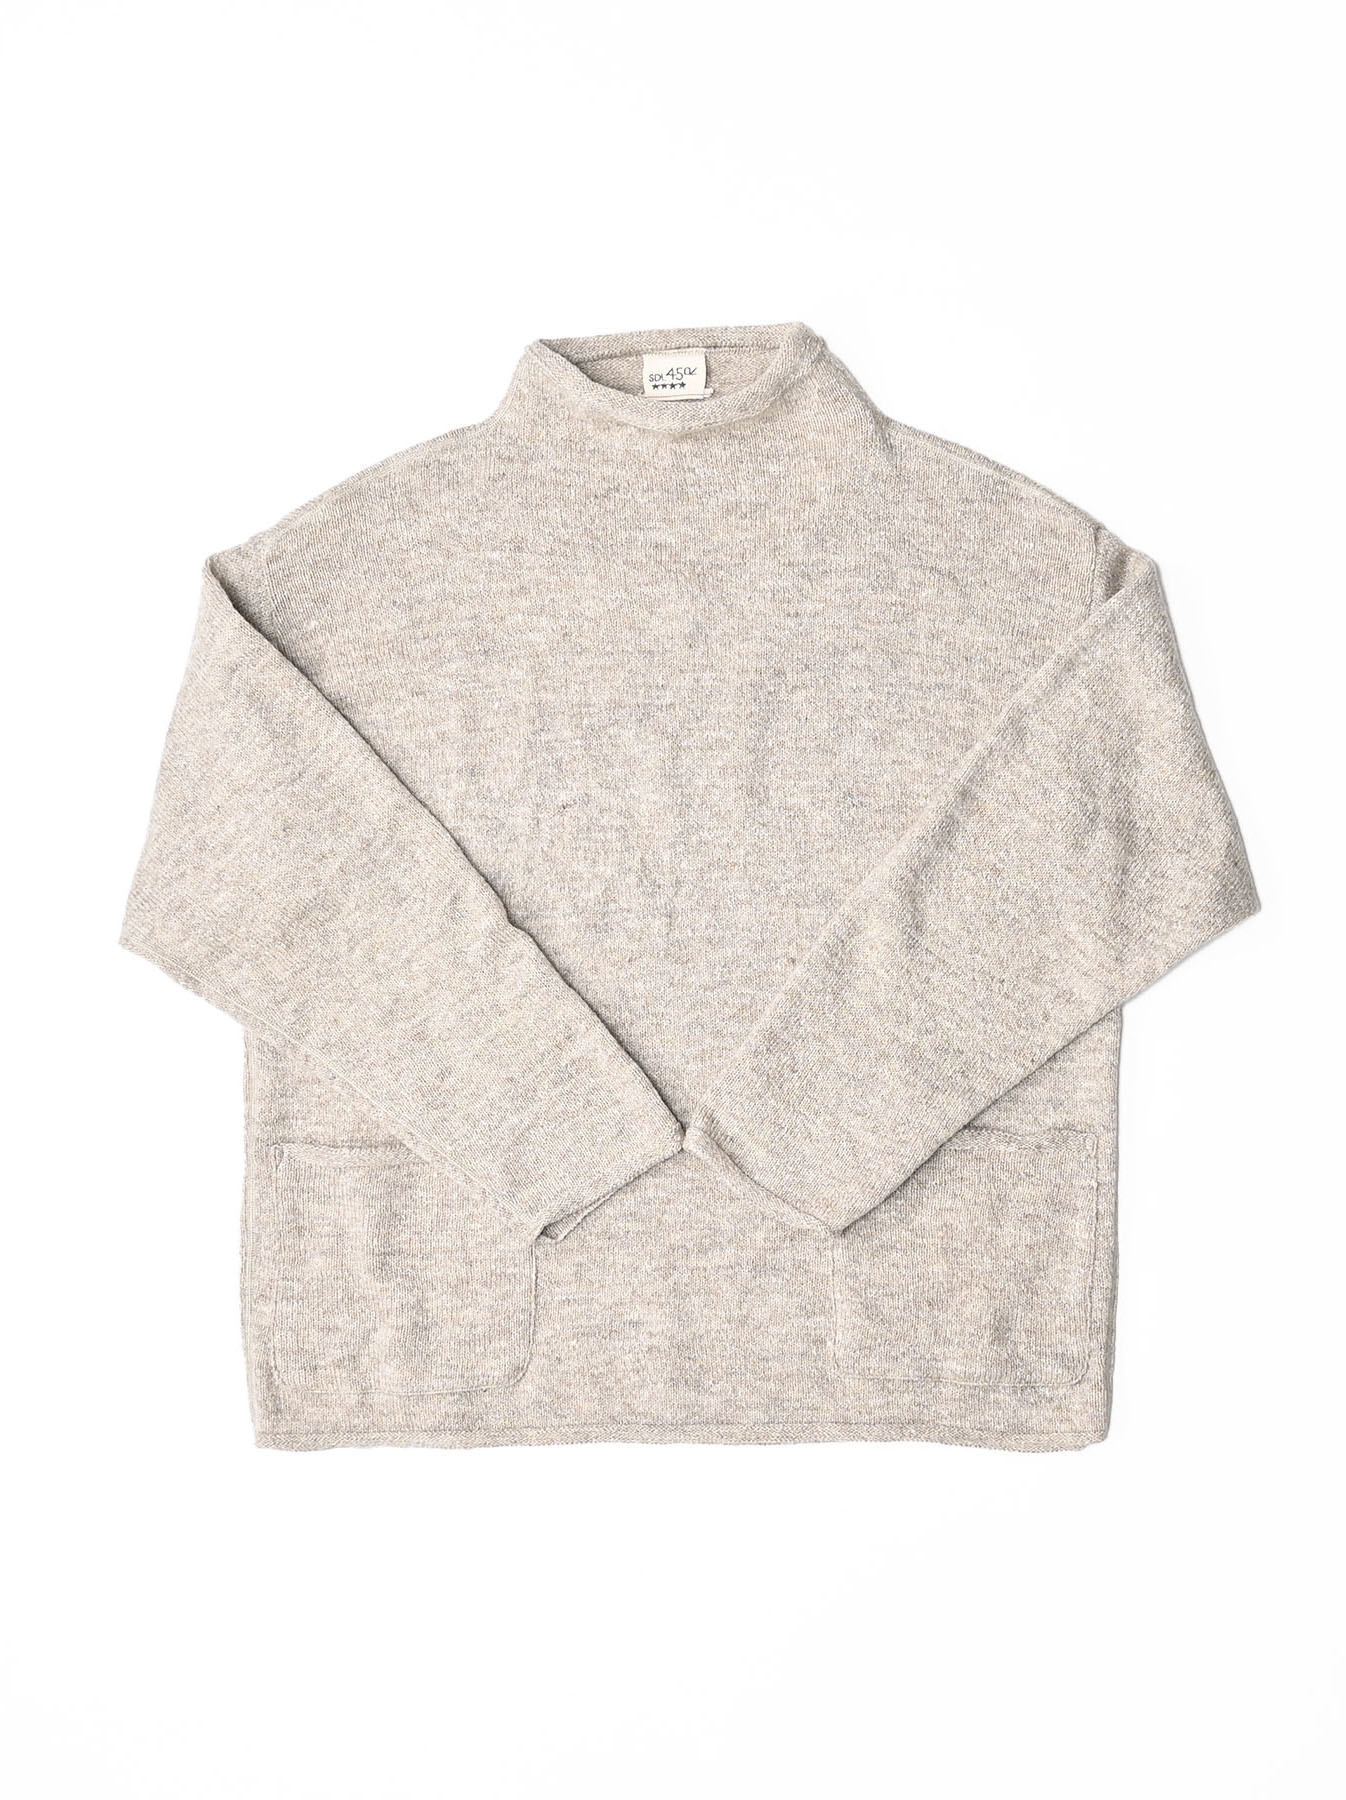 Cotton Shetland Knit-sew Mockneck Sweater-3